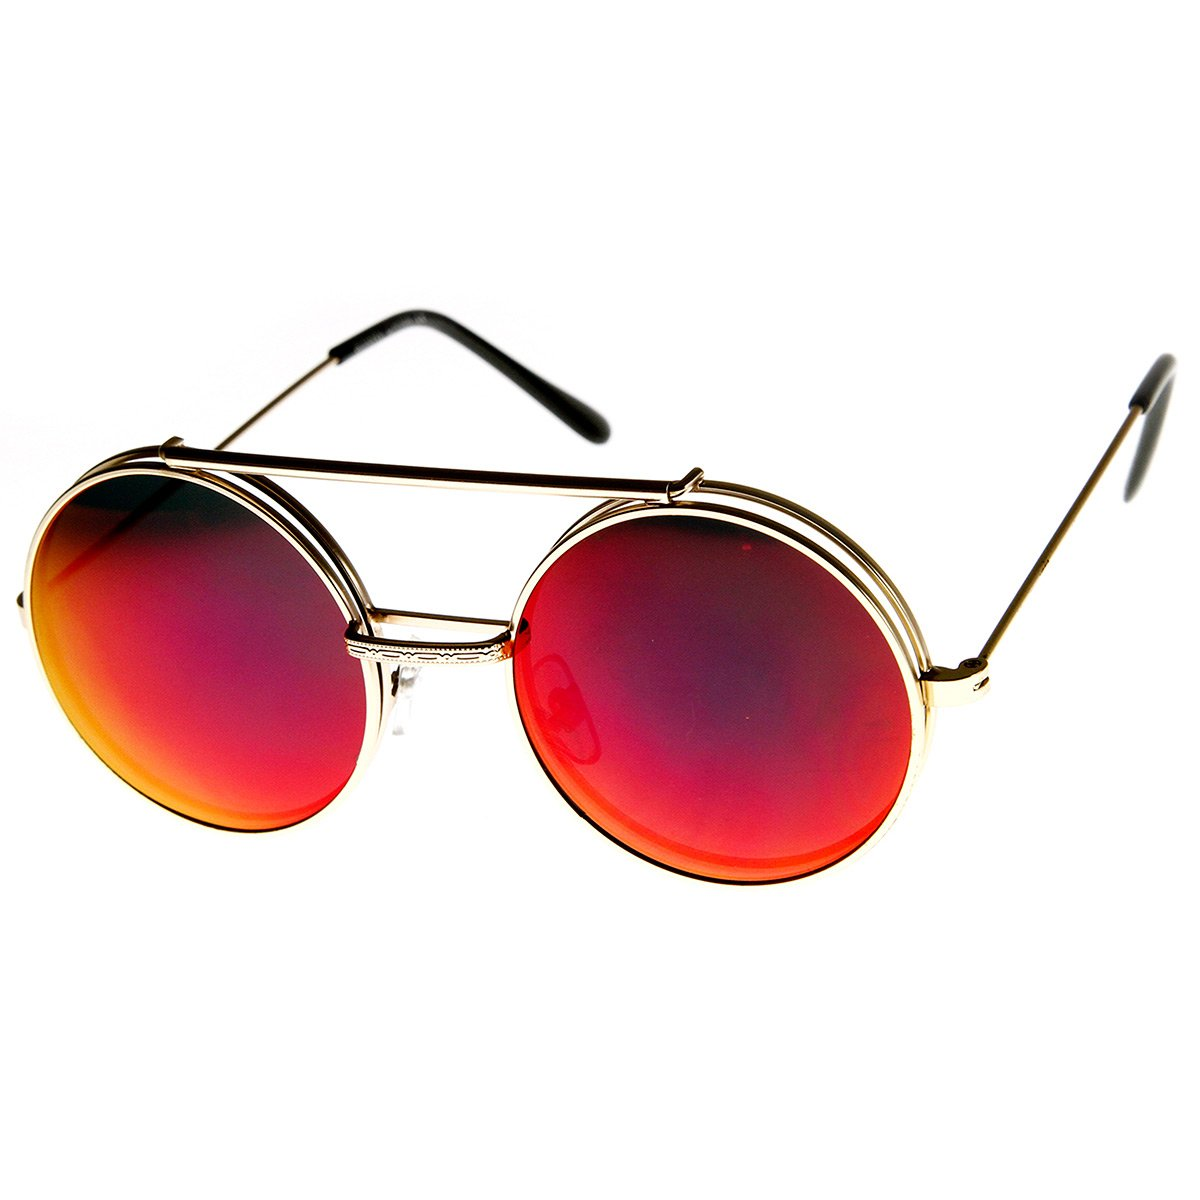 Limited Edition Red Mirror Flip-Up Lens Round Circle Django Sunglasses frame&optic ZV-8966k